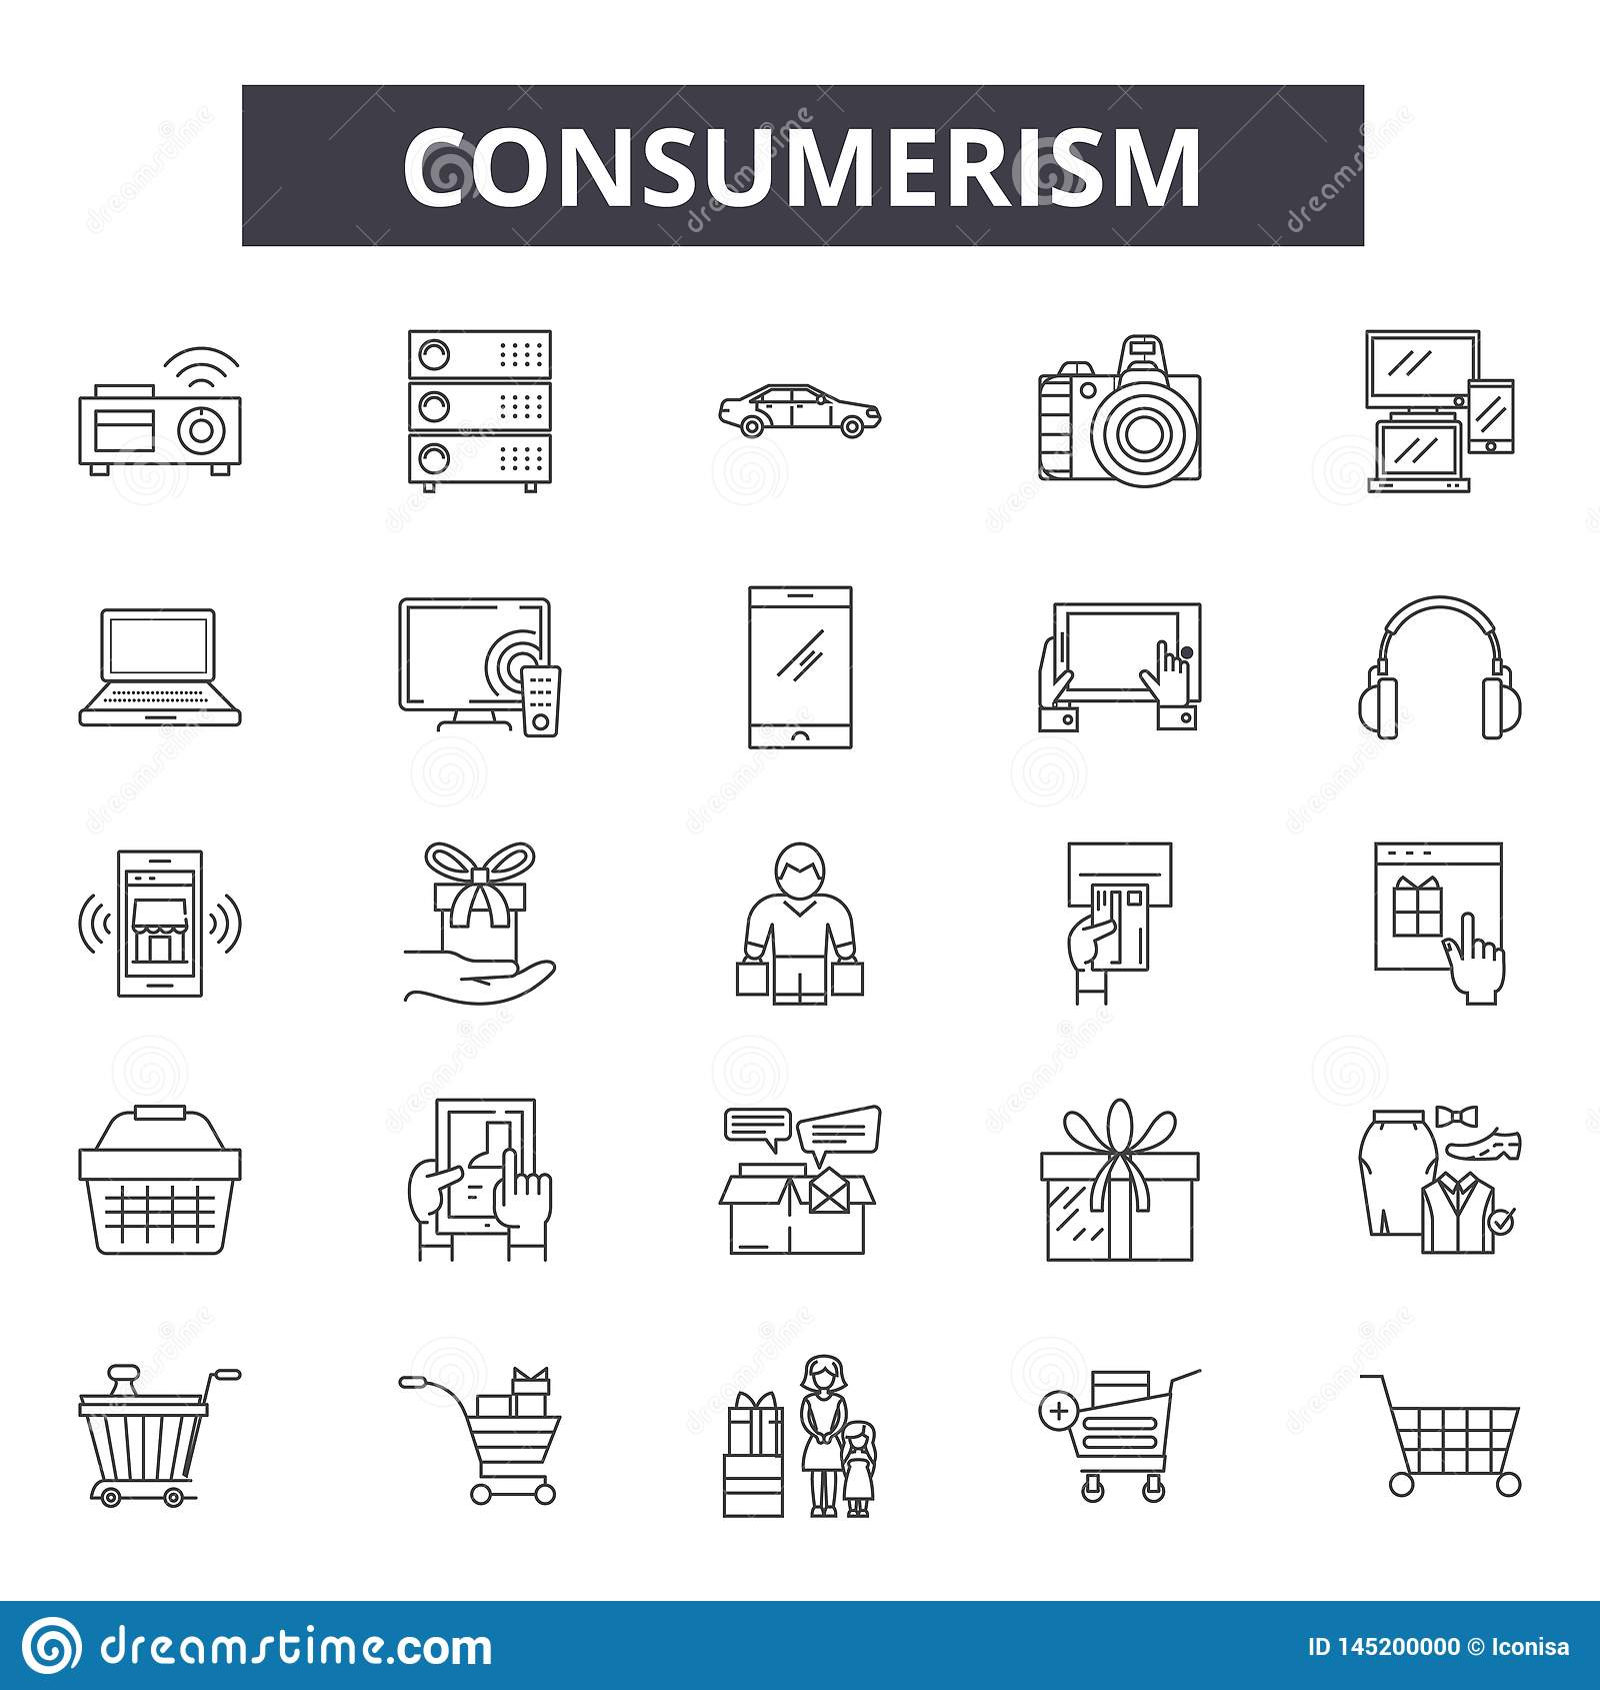 Consumerism line icons, signs, vector set, outline illustration concept